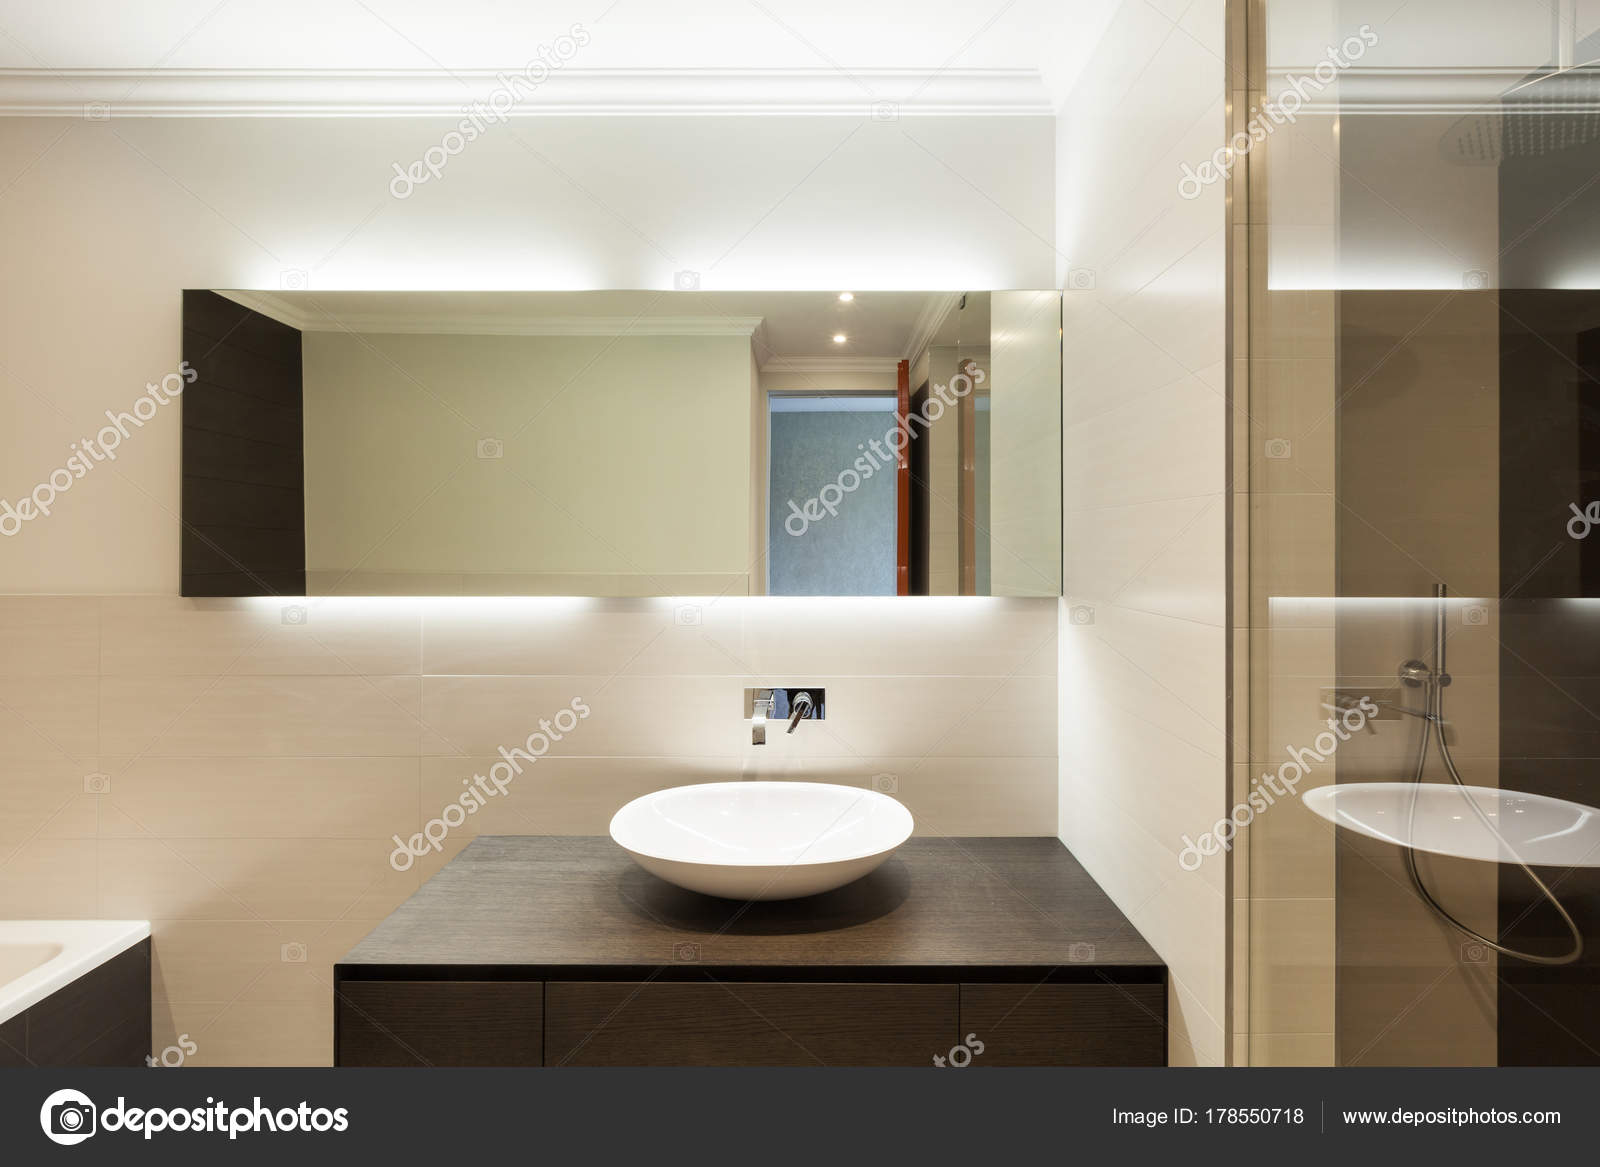 Mooie Moderne Badkamers : Mooie moderne badkamer keramische wastafel spiegel u2014 stockfoto